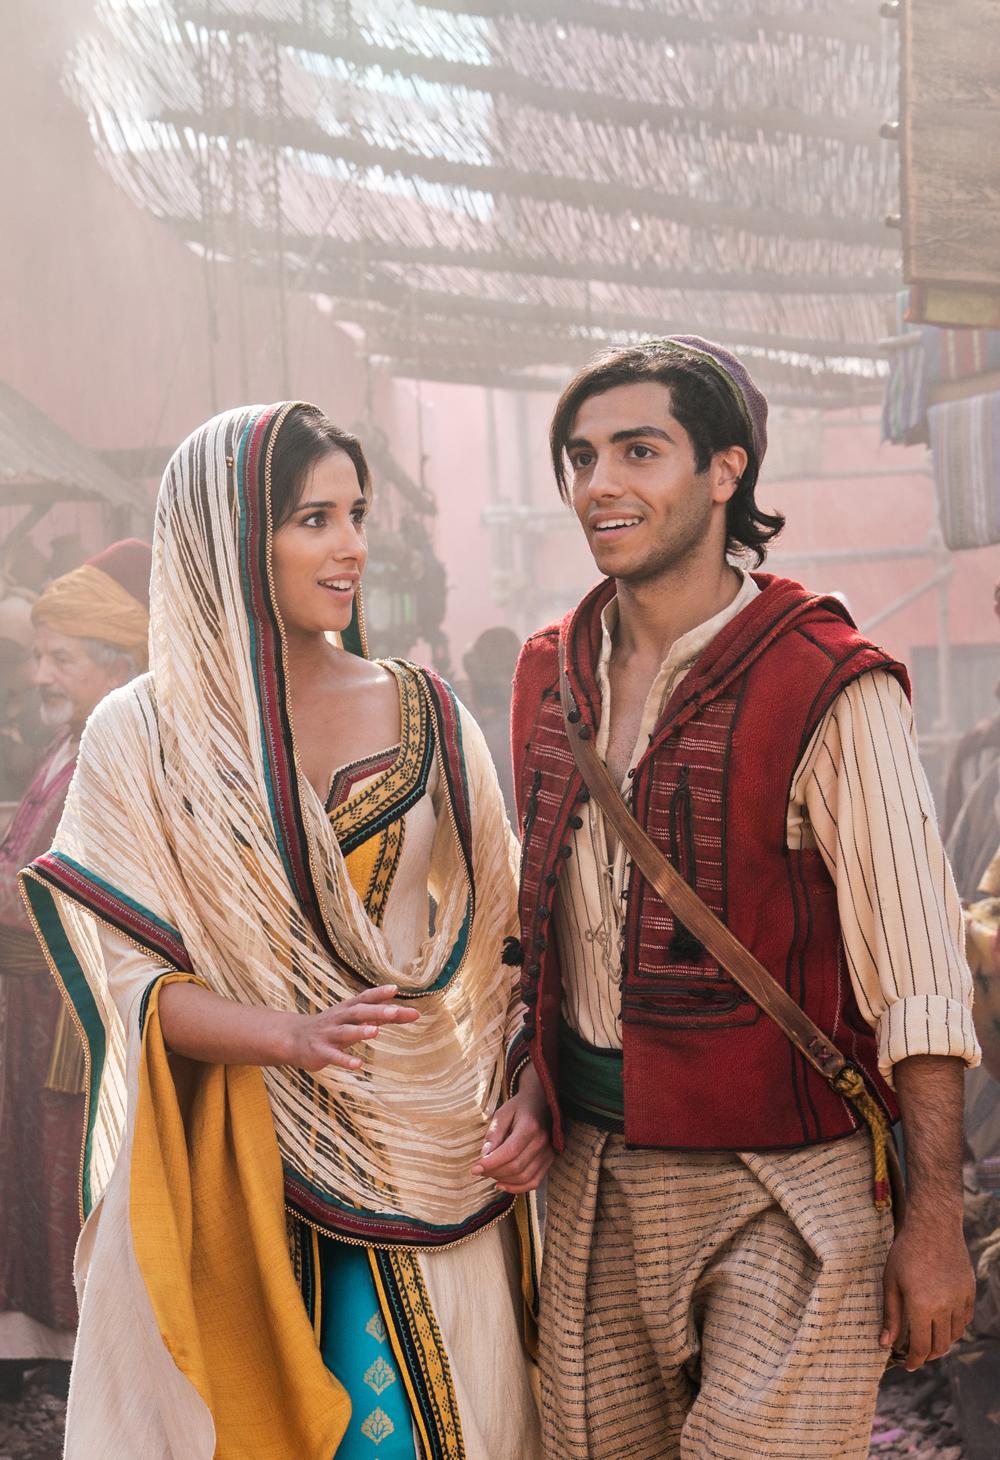 Aladdin Kritik 2019 mit Naomi Scott und Mena Massoud